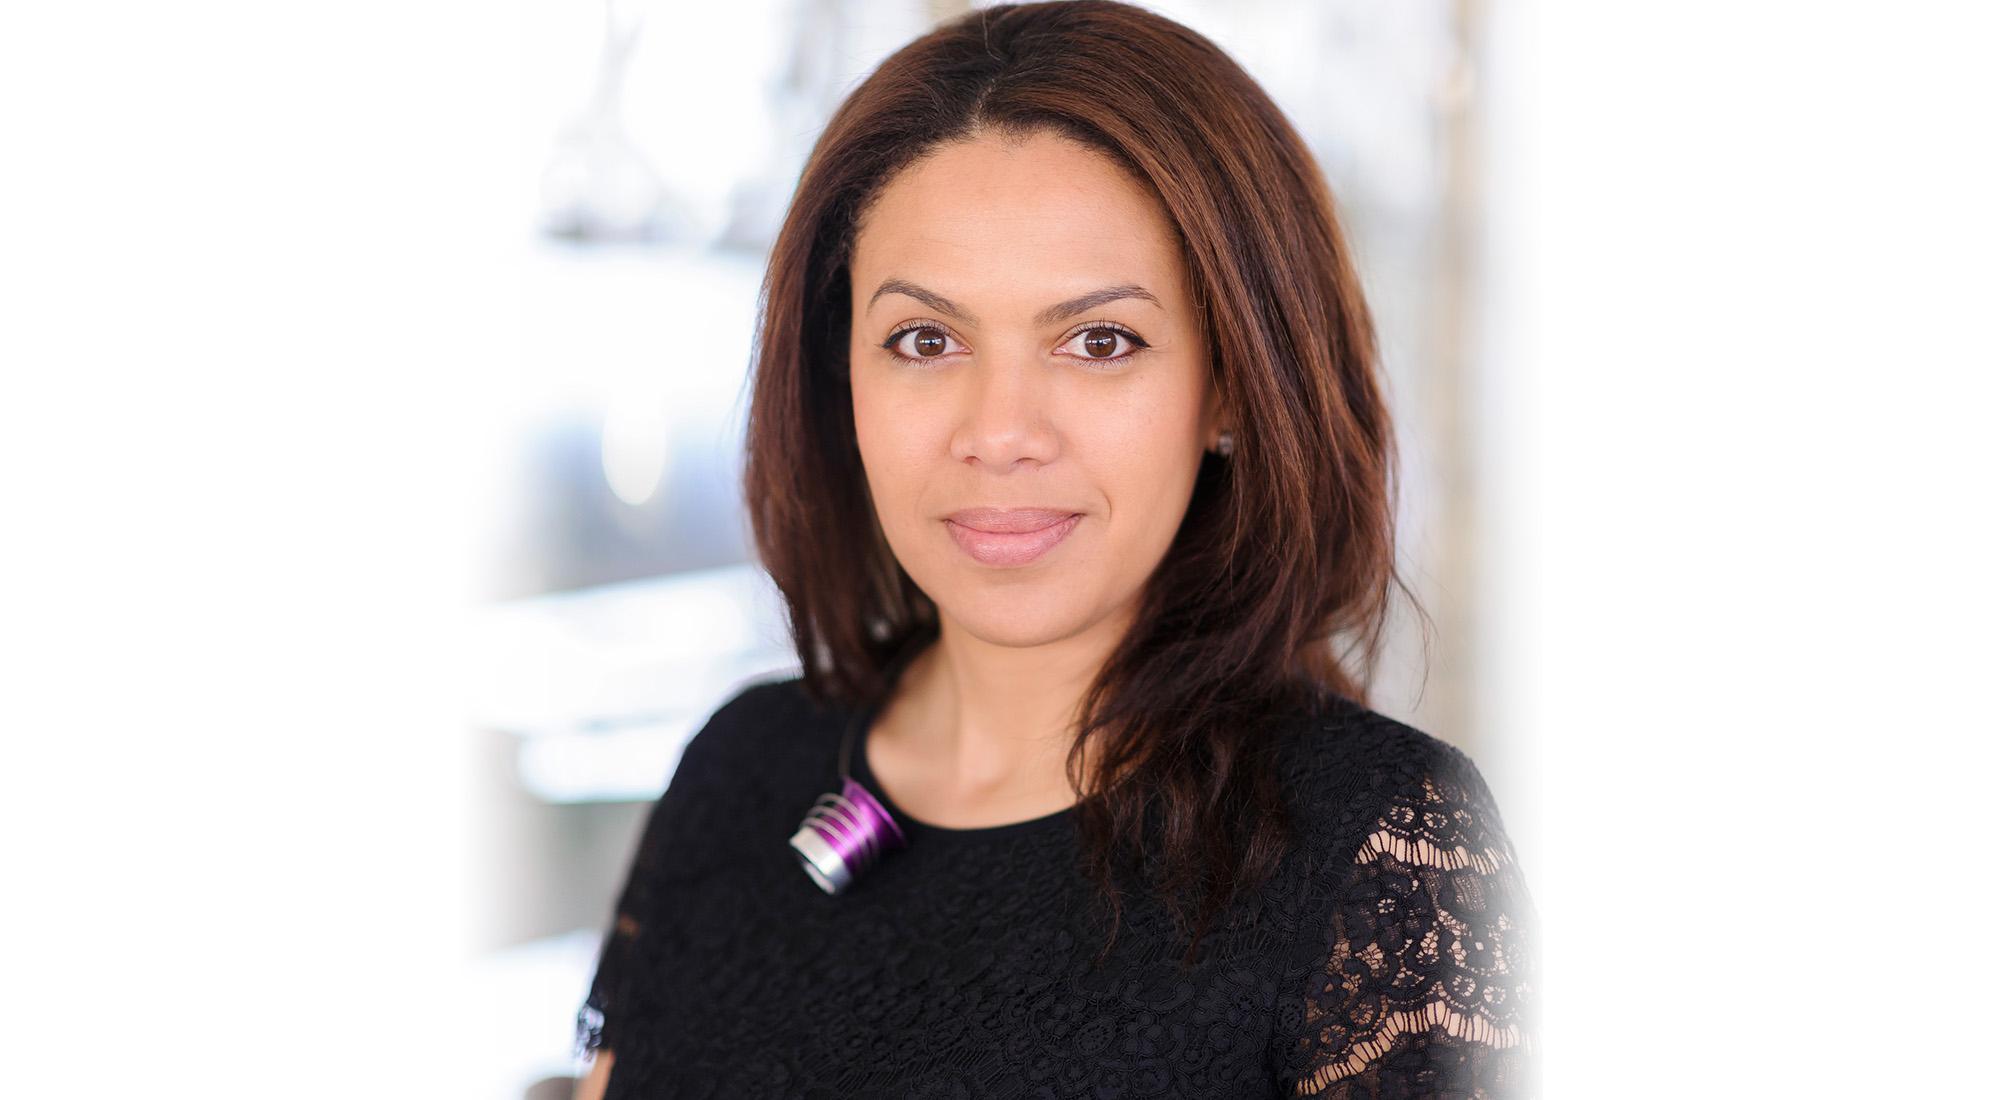 Nathalie Jean-Louis